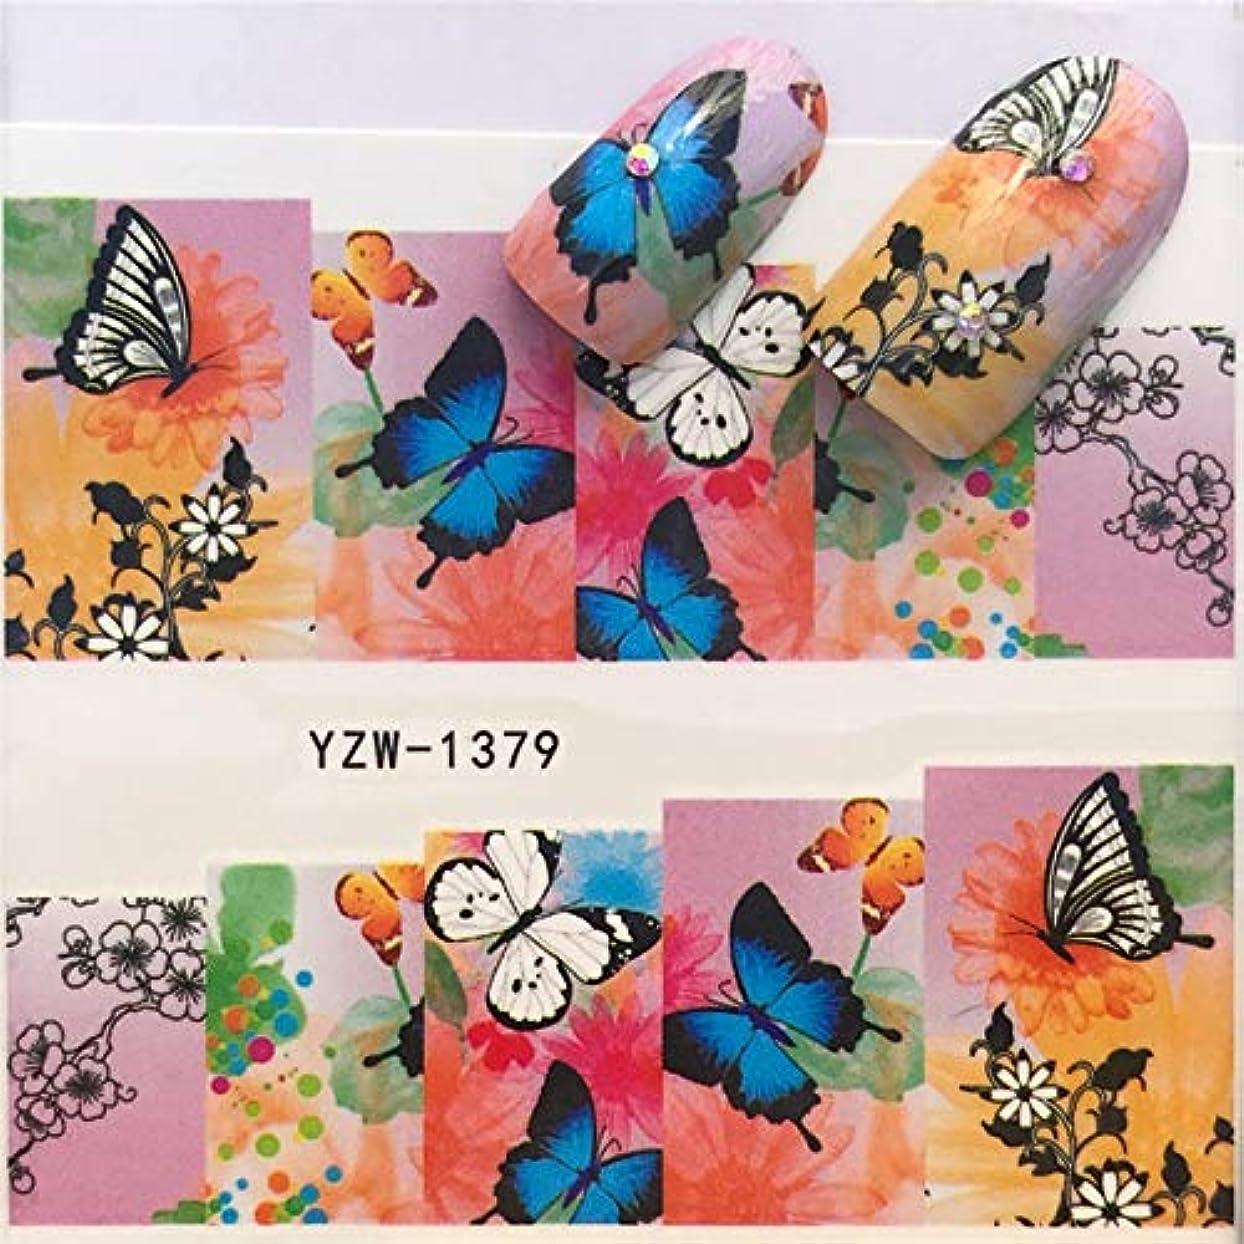 Yan 3ピースネイルステッカーセットデカール水転写スライダーネイルアートデコレーション、色:YZW1379